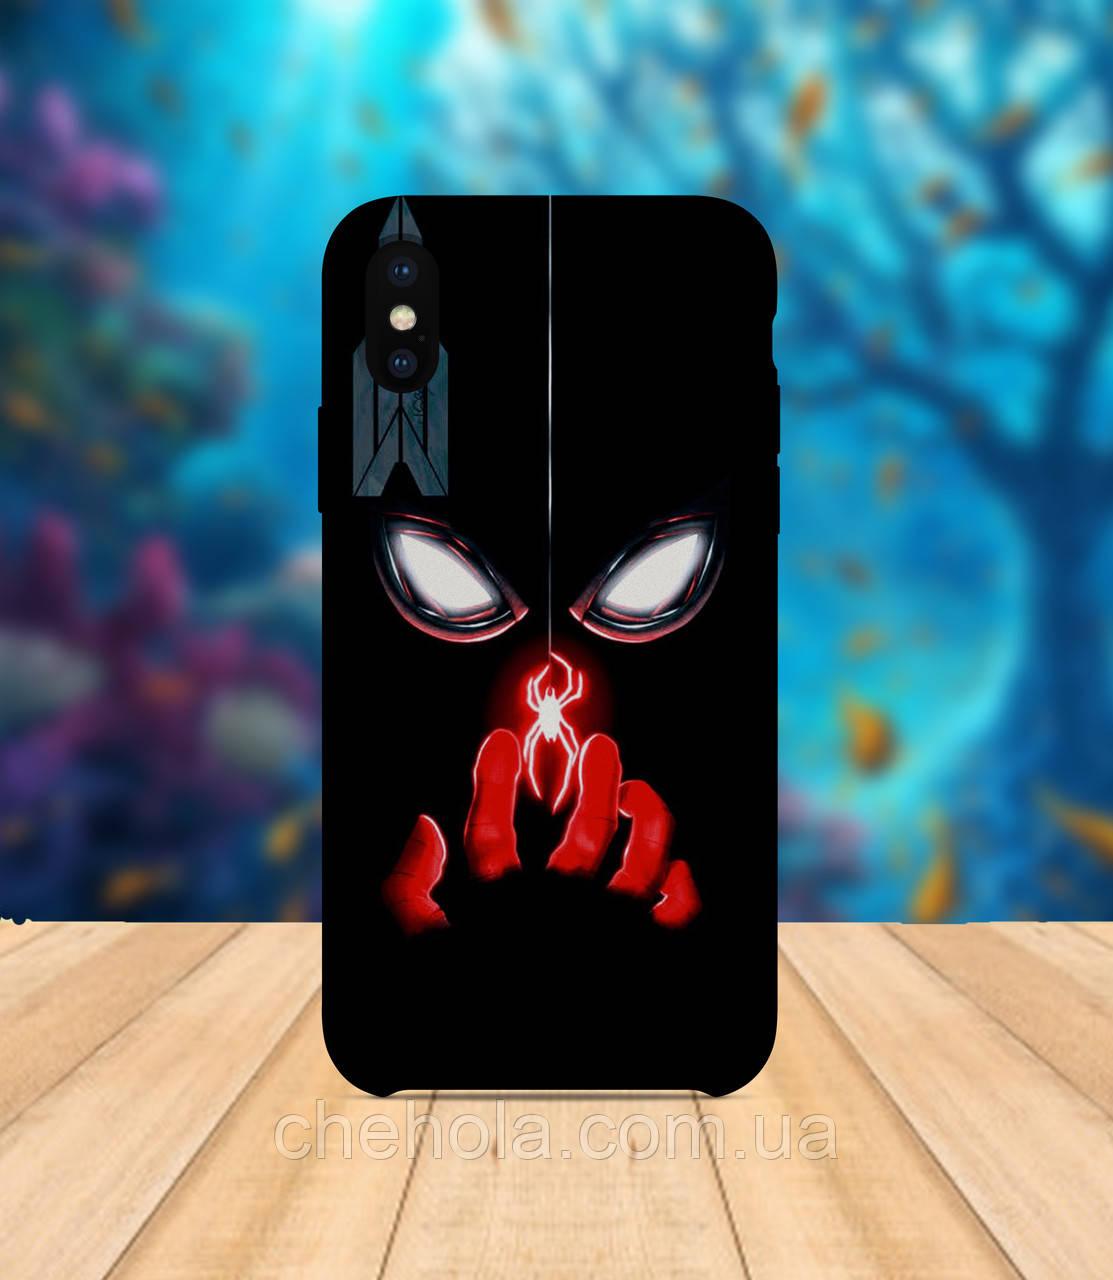 Чохол для apple iphone x XS max Людина павук чорний чохол з принтом